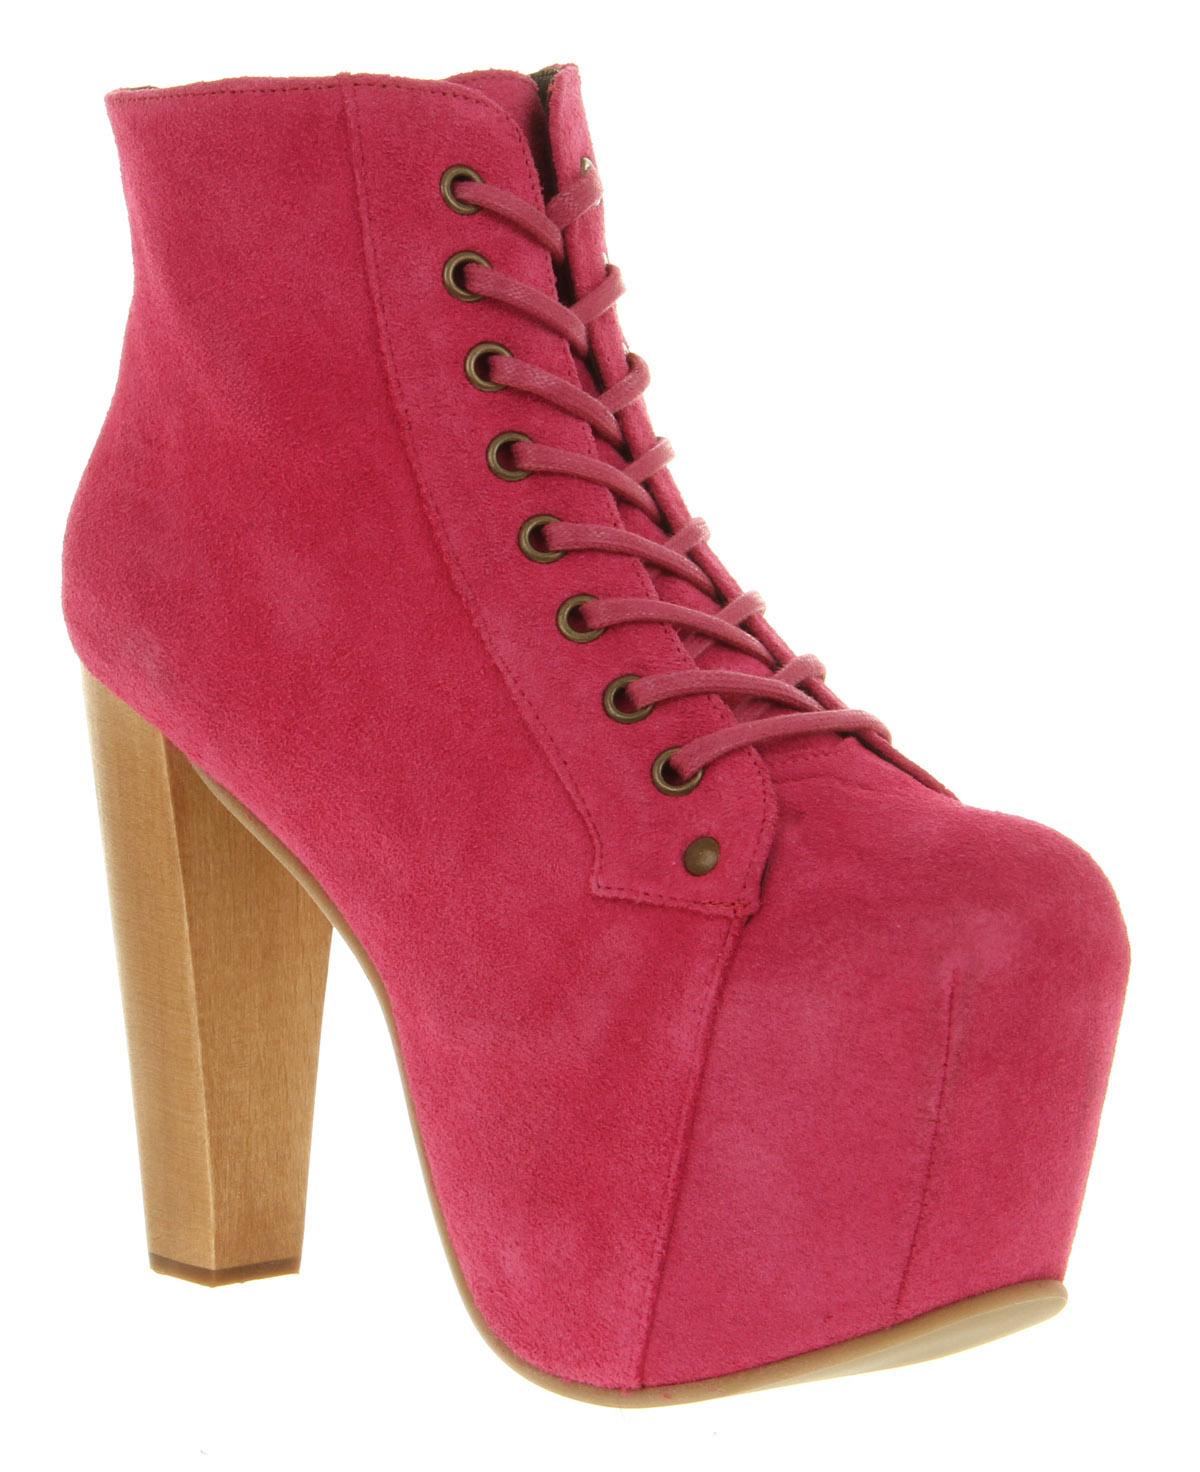 Womens jeffrey campbell lita platform ankle boot bright pink sde boots size 8 ebay - Jeffrey campbell lita platform boots ...